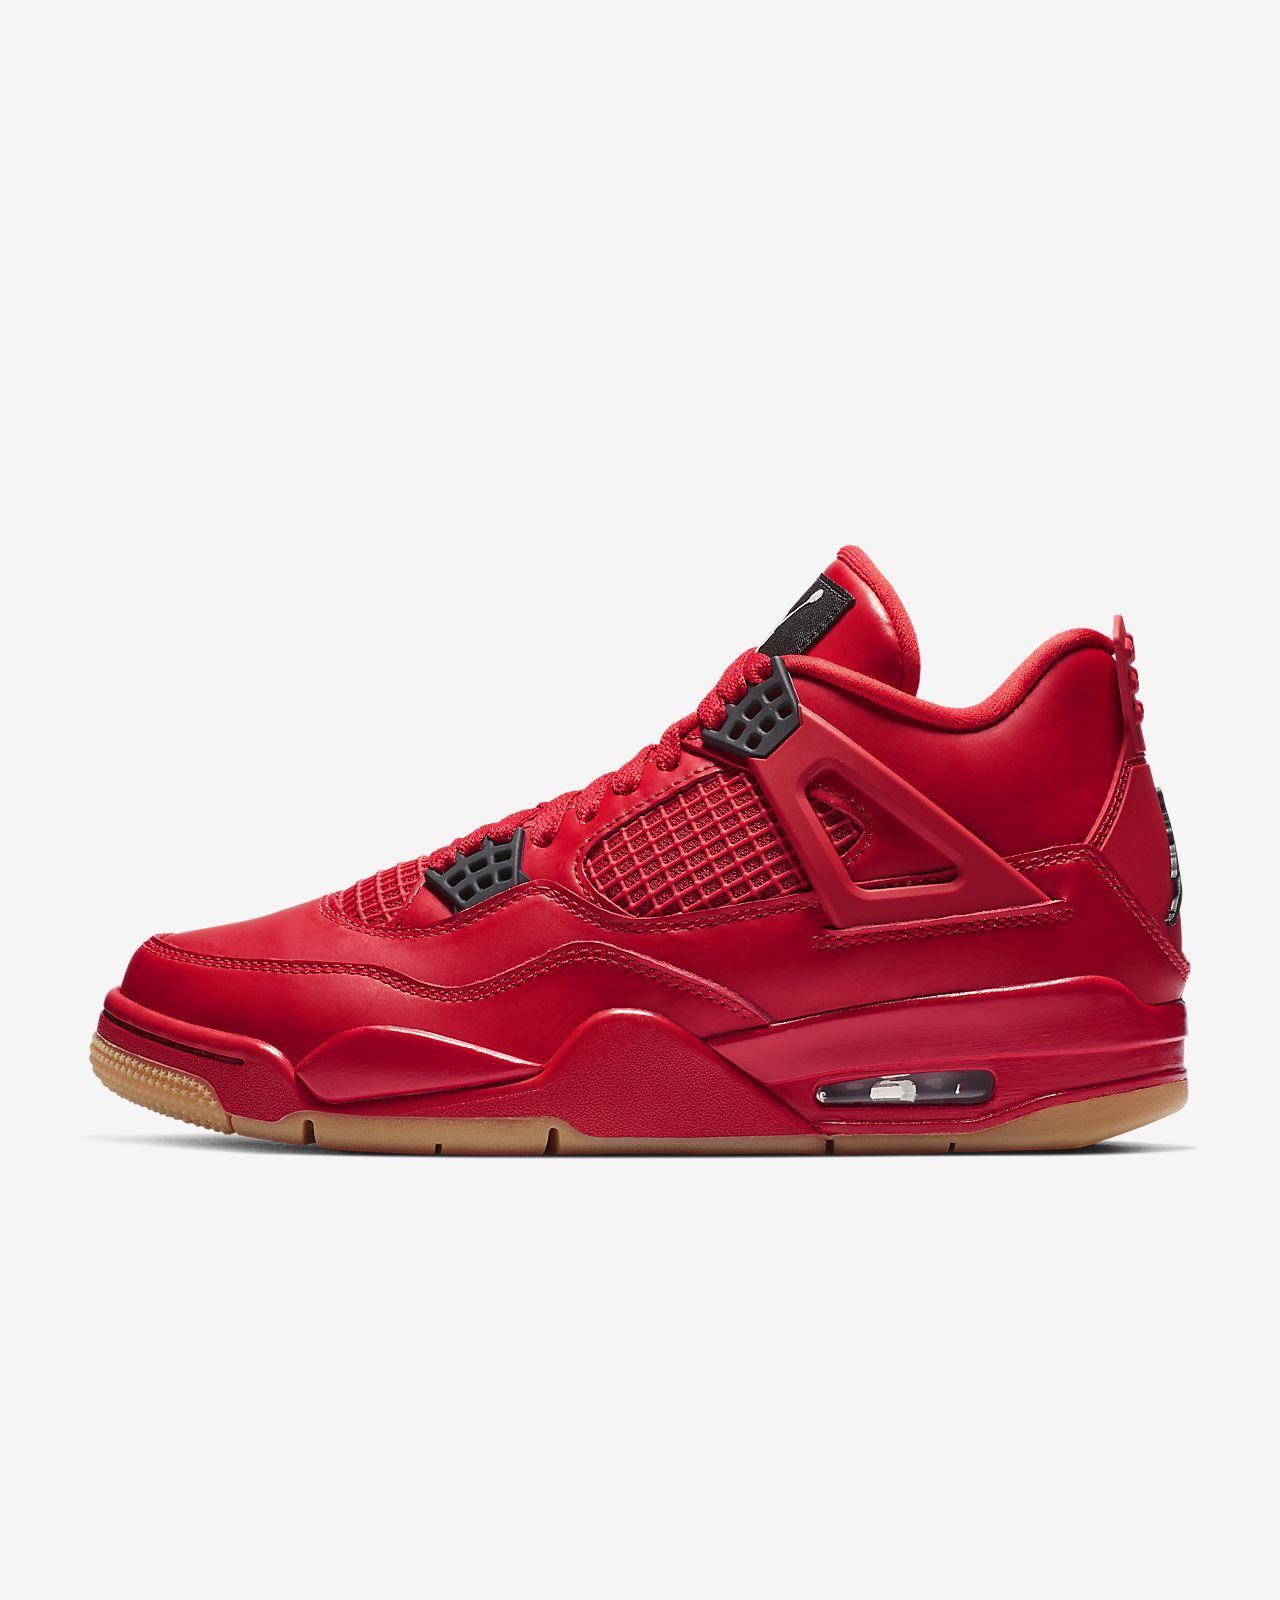 Air Jordan 4 Retro Women's Shoe